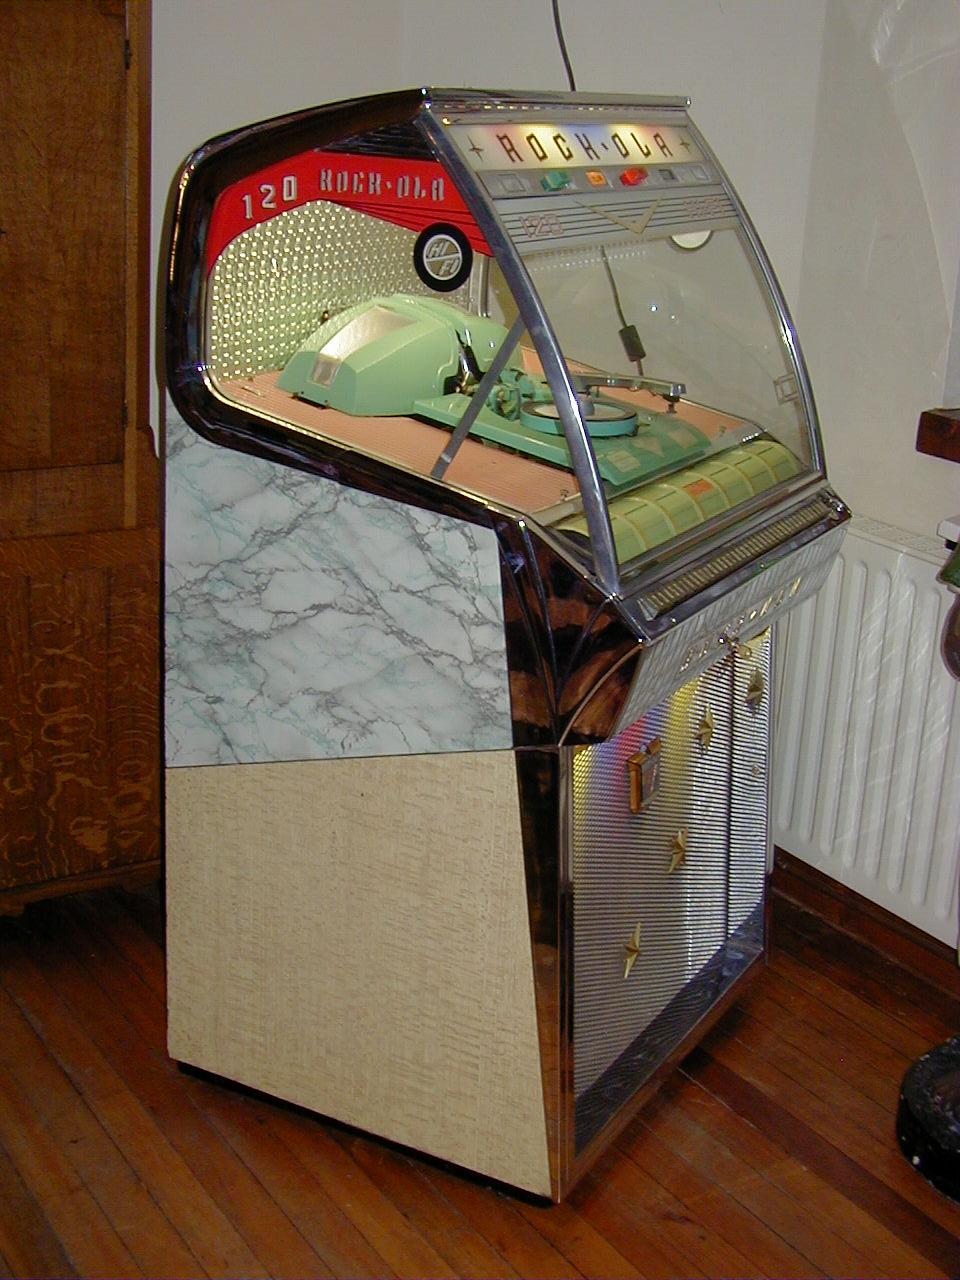 jukebox sale Wurlitzer,seeburg, rockola,ami,nsm: Fabulous fifties